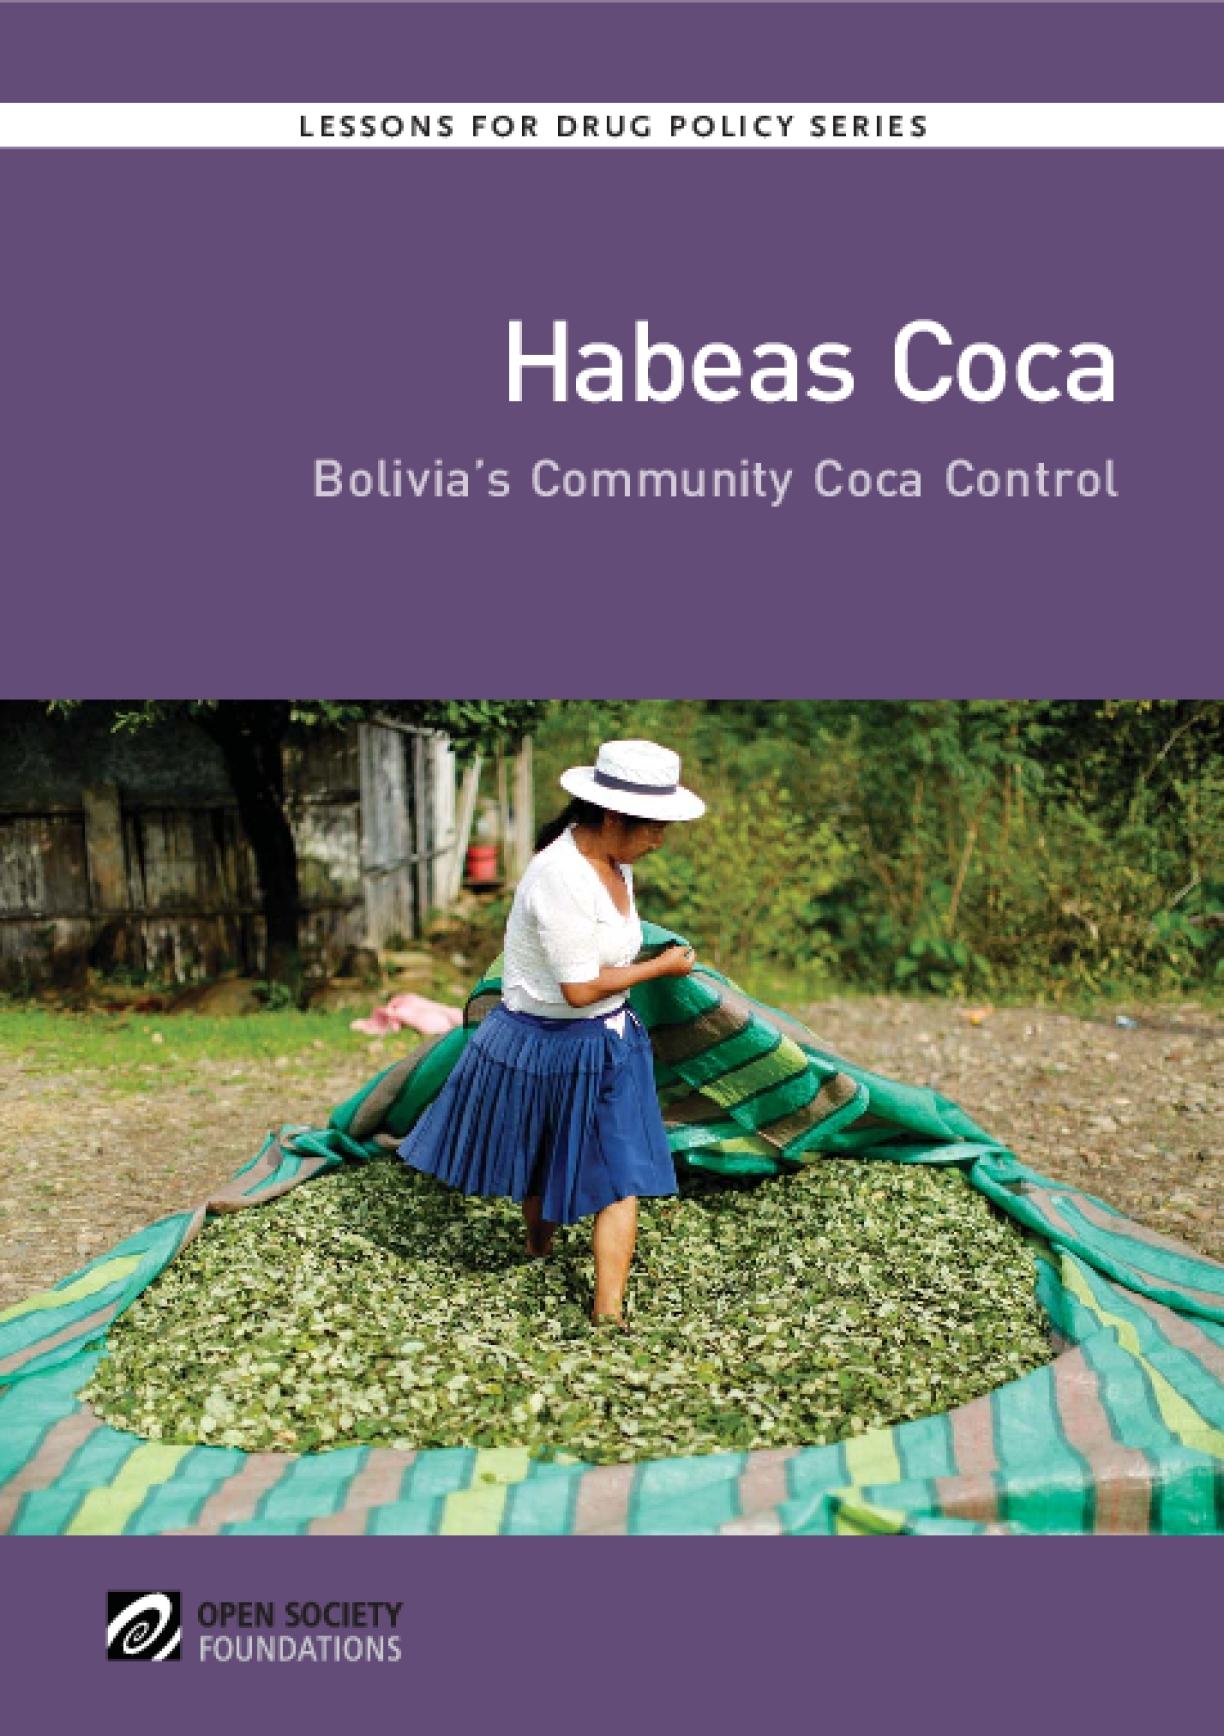 Habeas Coca: Bolivia's Community Coca Control